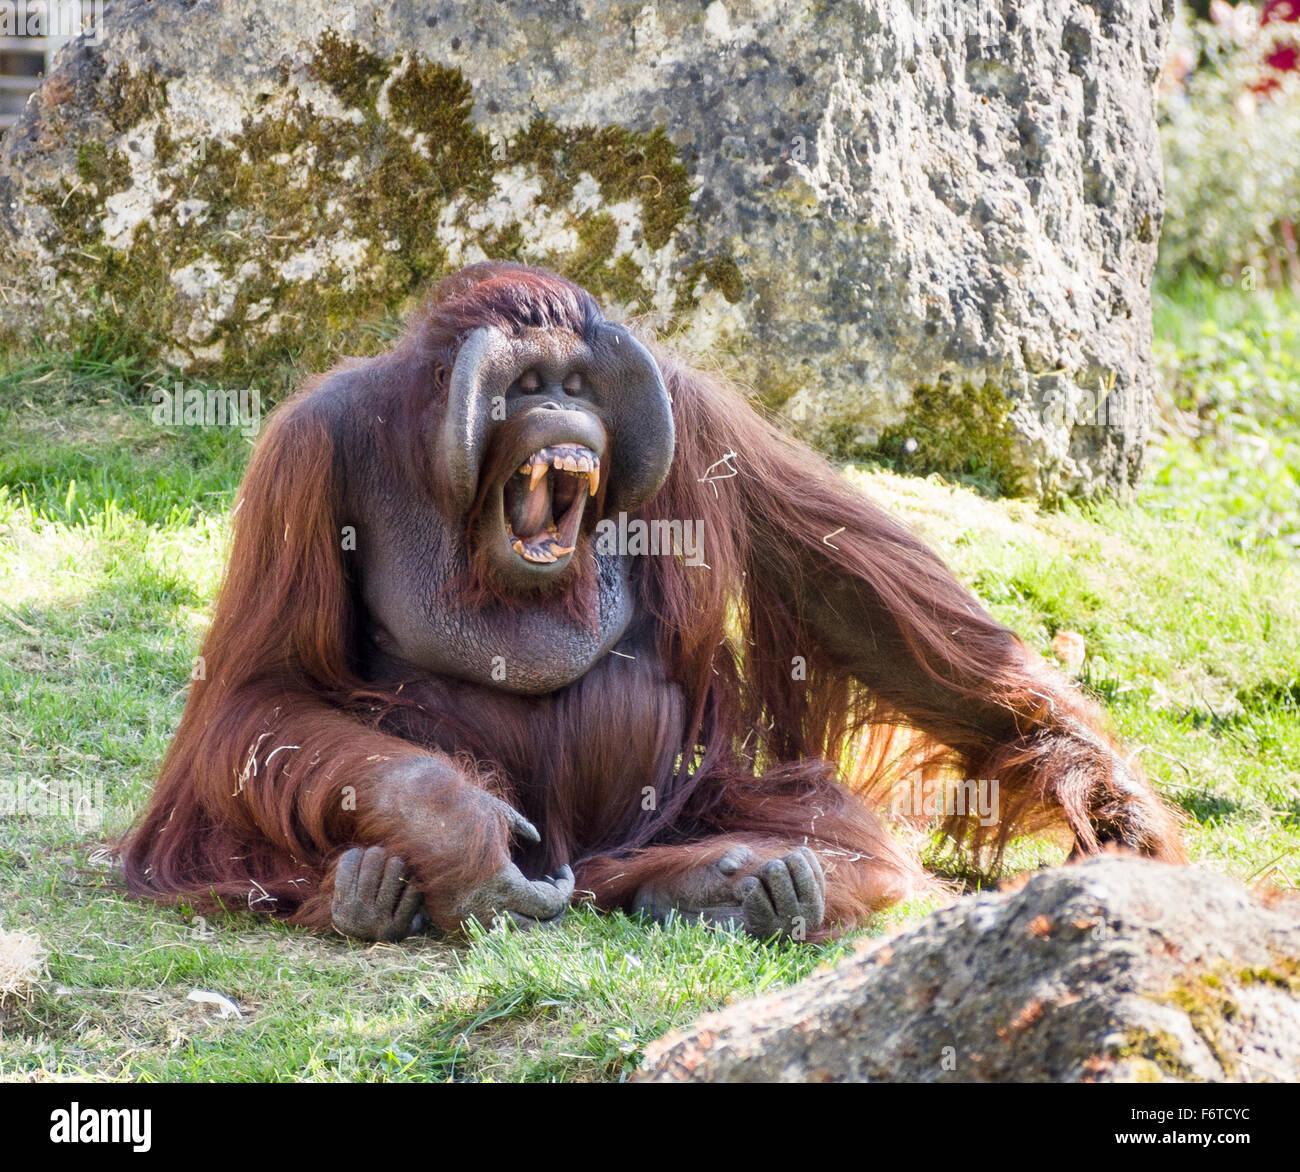 Orangutan Showing his Incisors . A large male orangutan calls out and displays a massive set of orange teeth - Stock Image